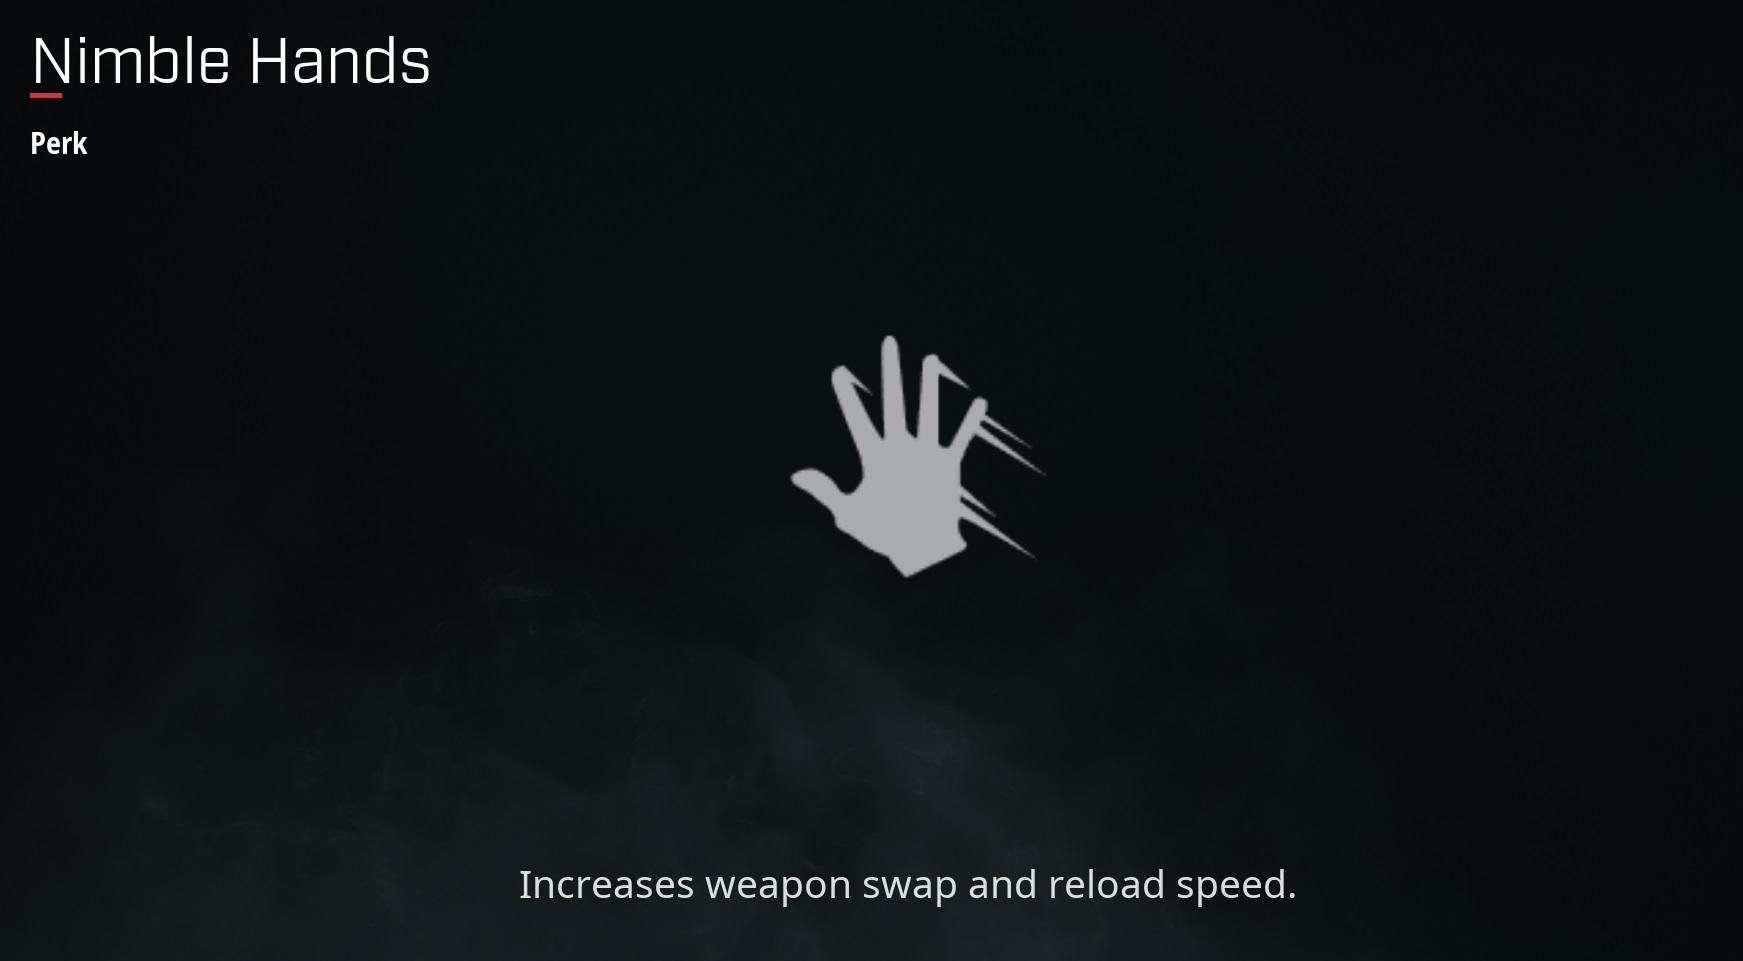 Nimble Hands